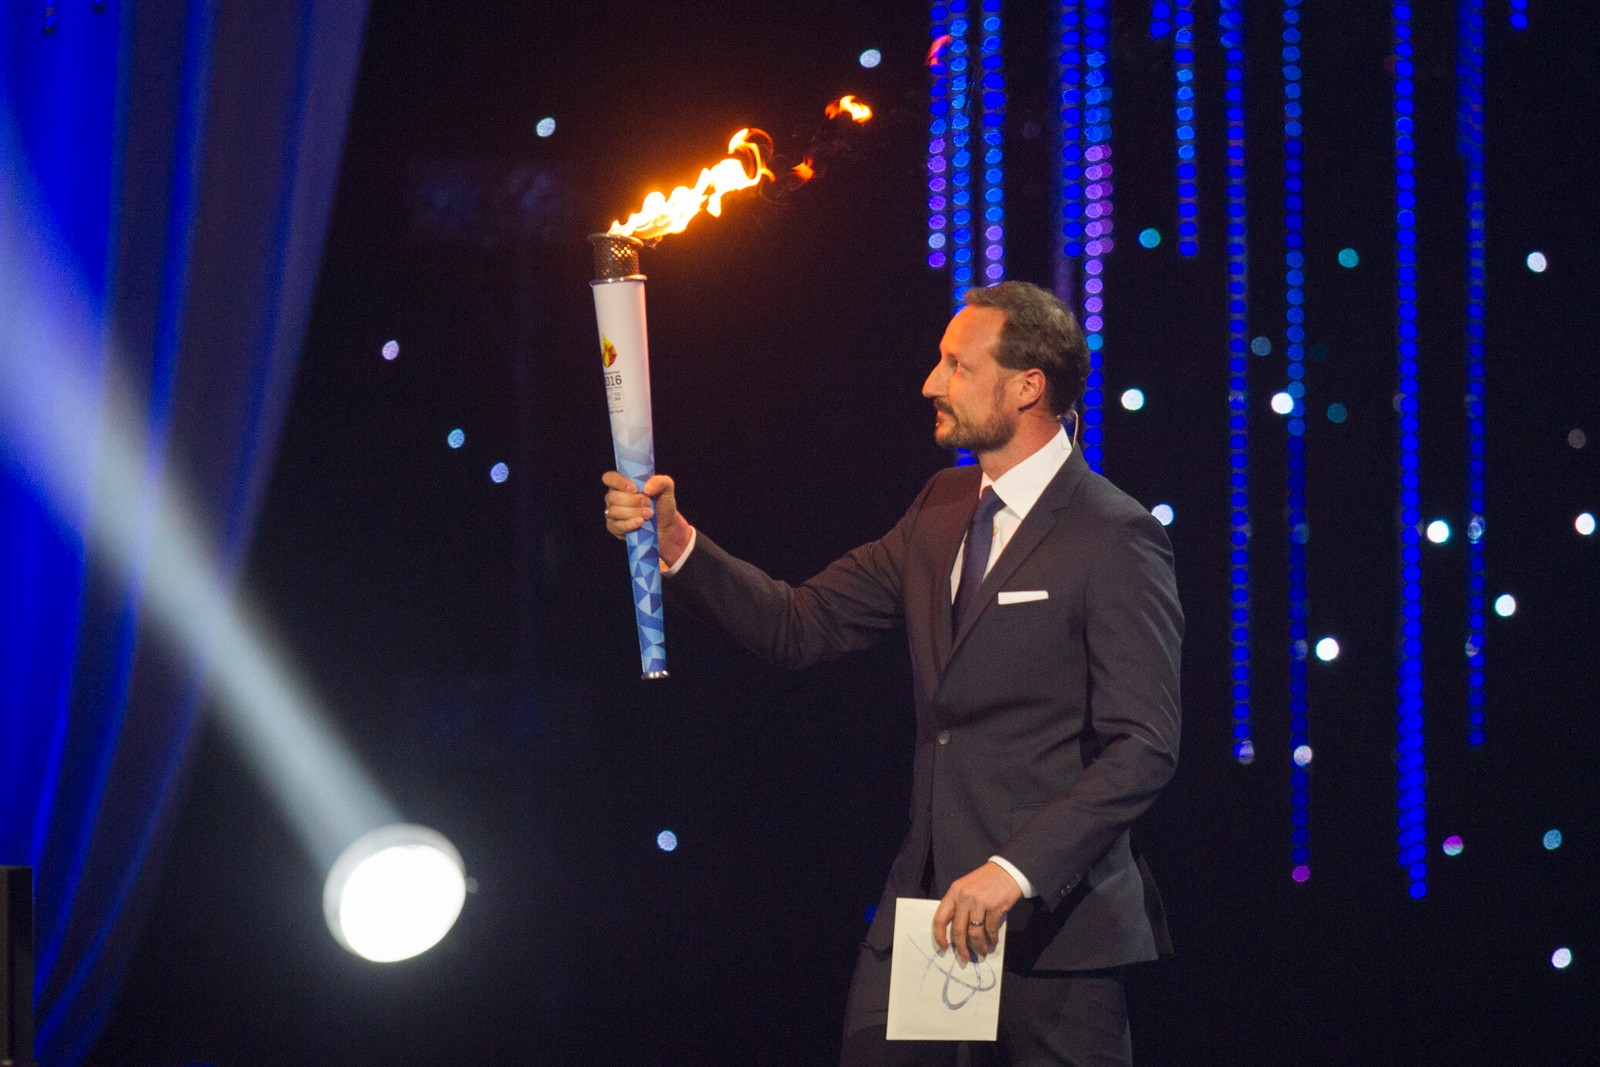 Kronprins Haakon med OL-ilden under Idrettsgallaen.